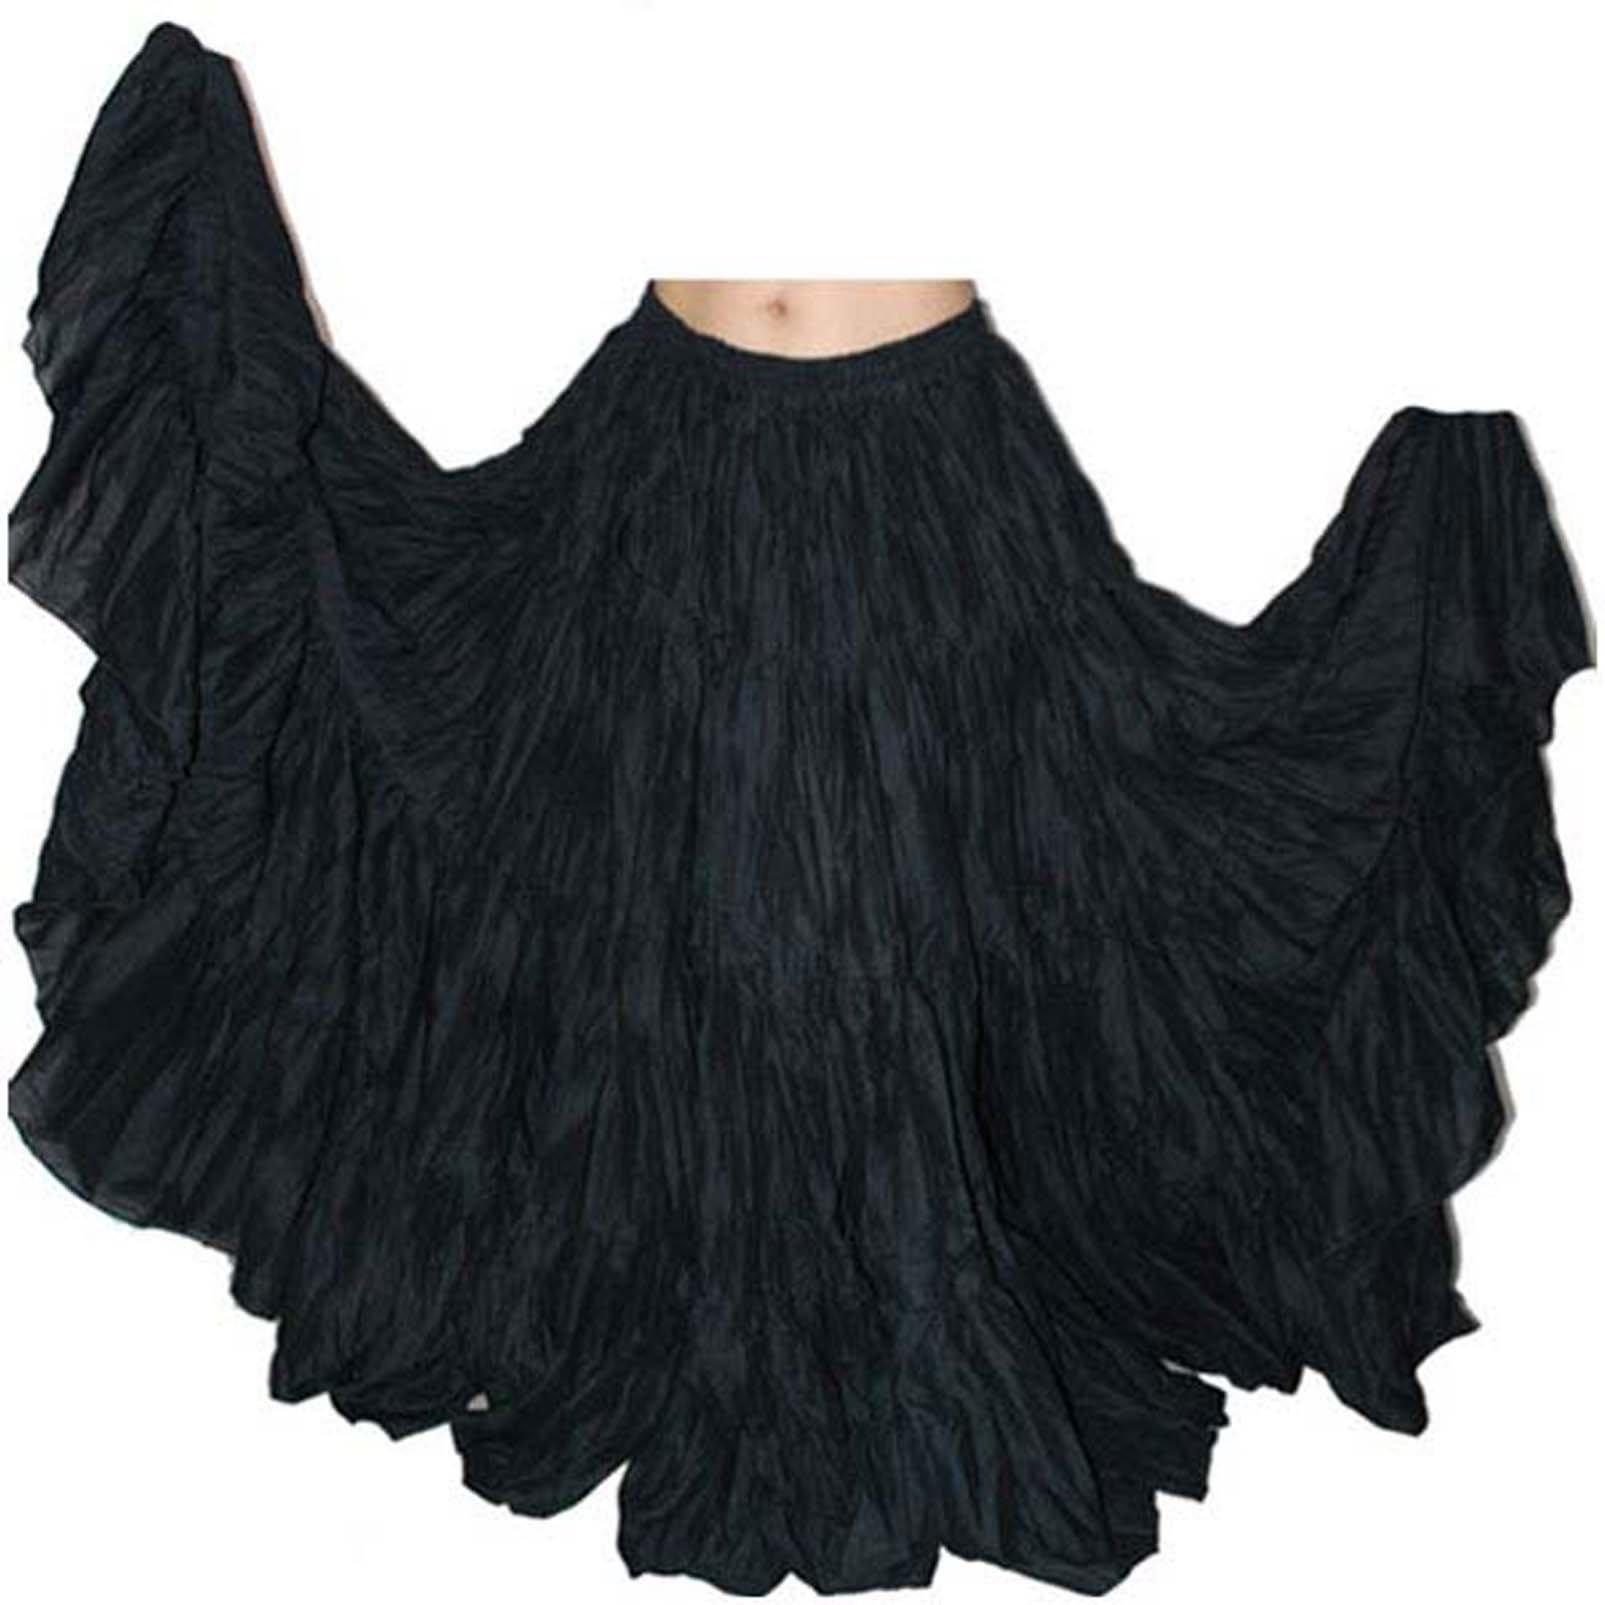 975f736e50 Cheap 1 Yard Skirt Pattern, find 1 Yard Skirt Pattern deals on line ...